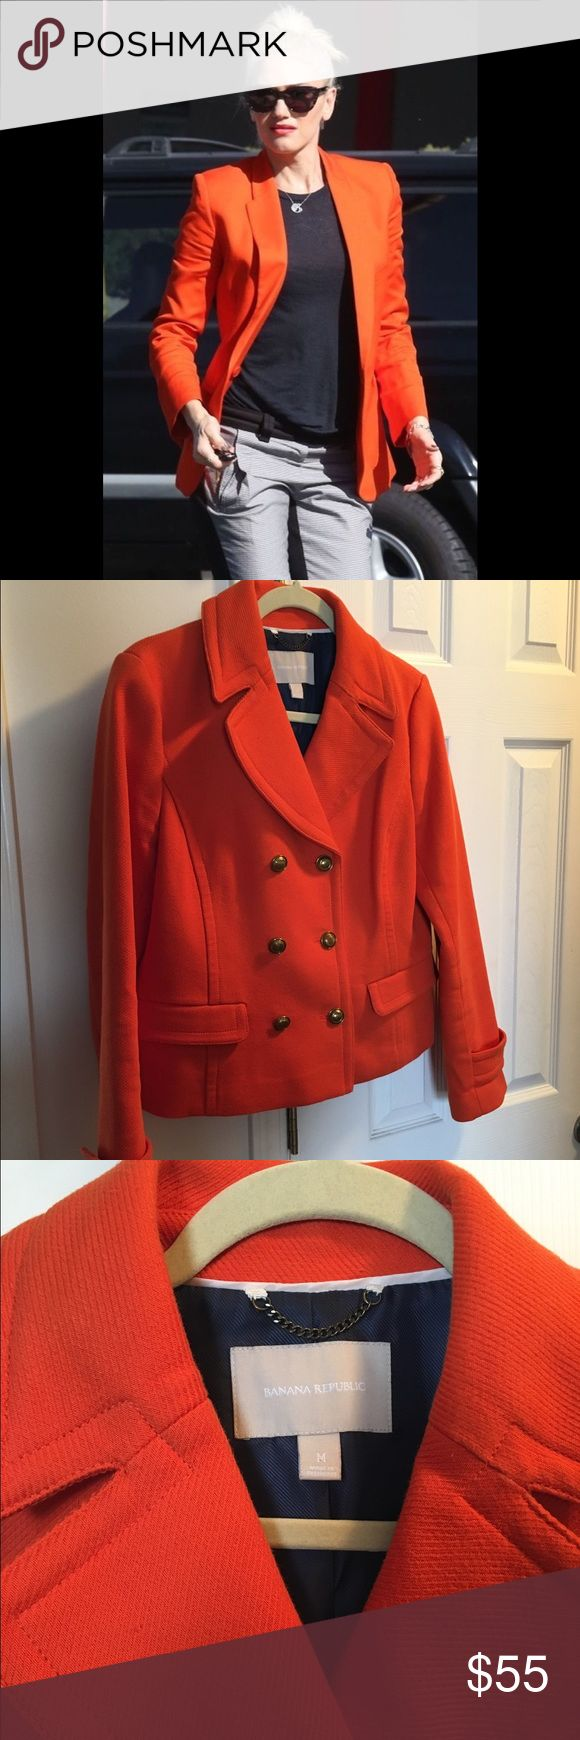 Banana Republic Peacoat Orange color. NWOT. Size medium. Banana Republic Jackets & Coats Pea Coats